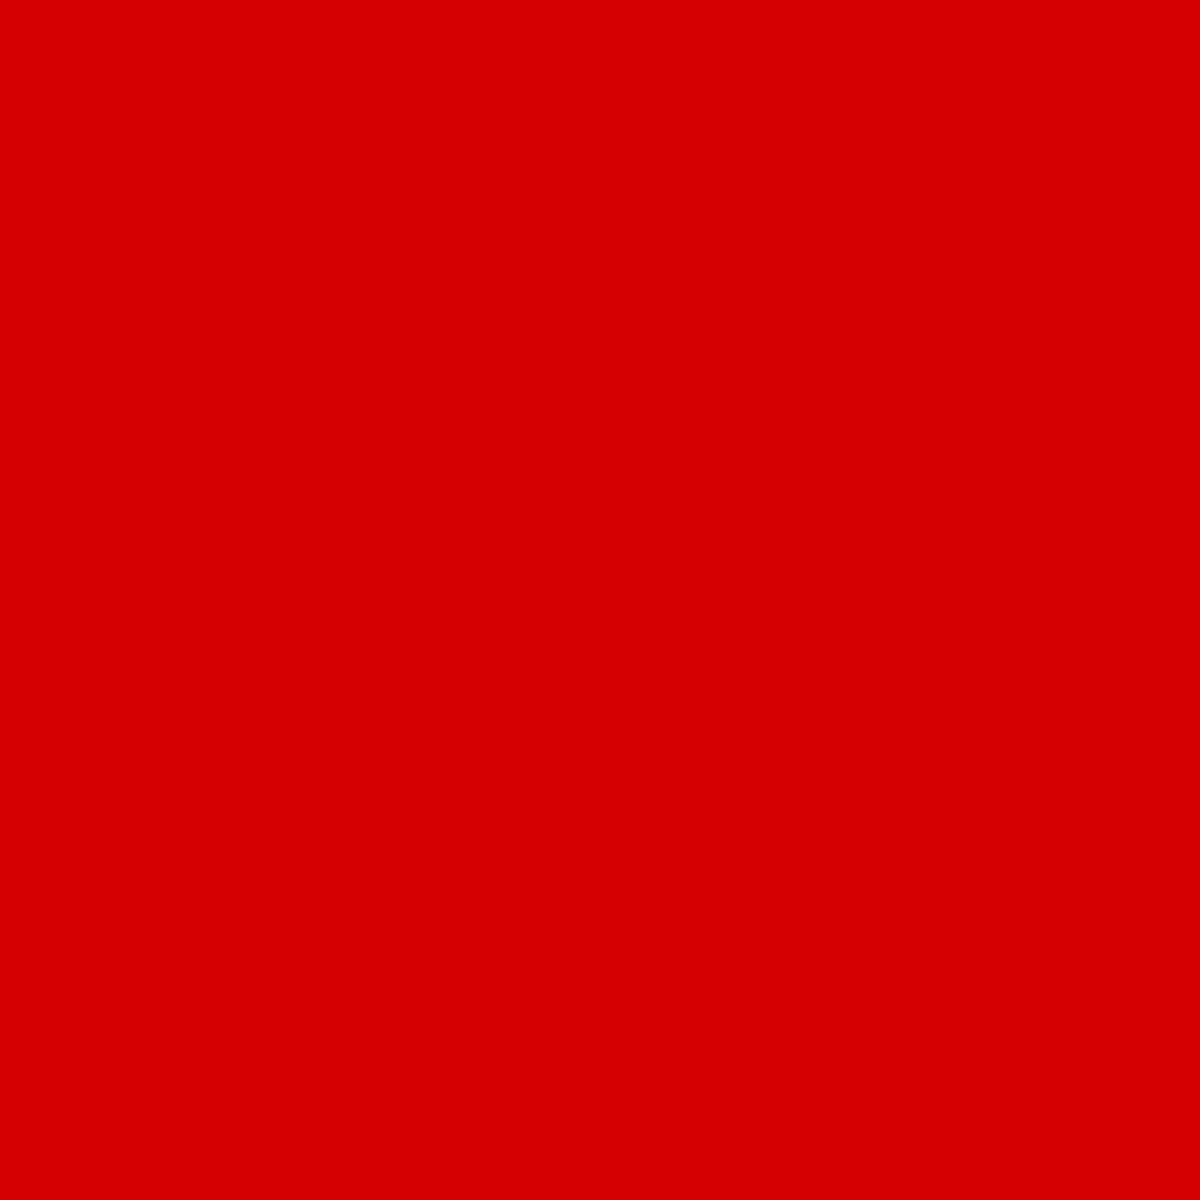 B1764 13 scarlet mens ties facemasks con murphys menswear cork - - Con Murphys Menswear